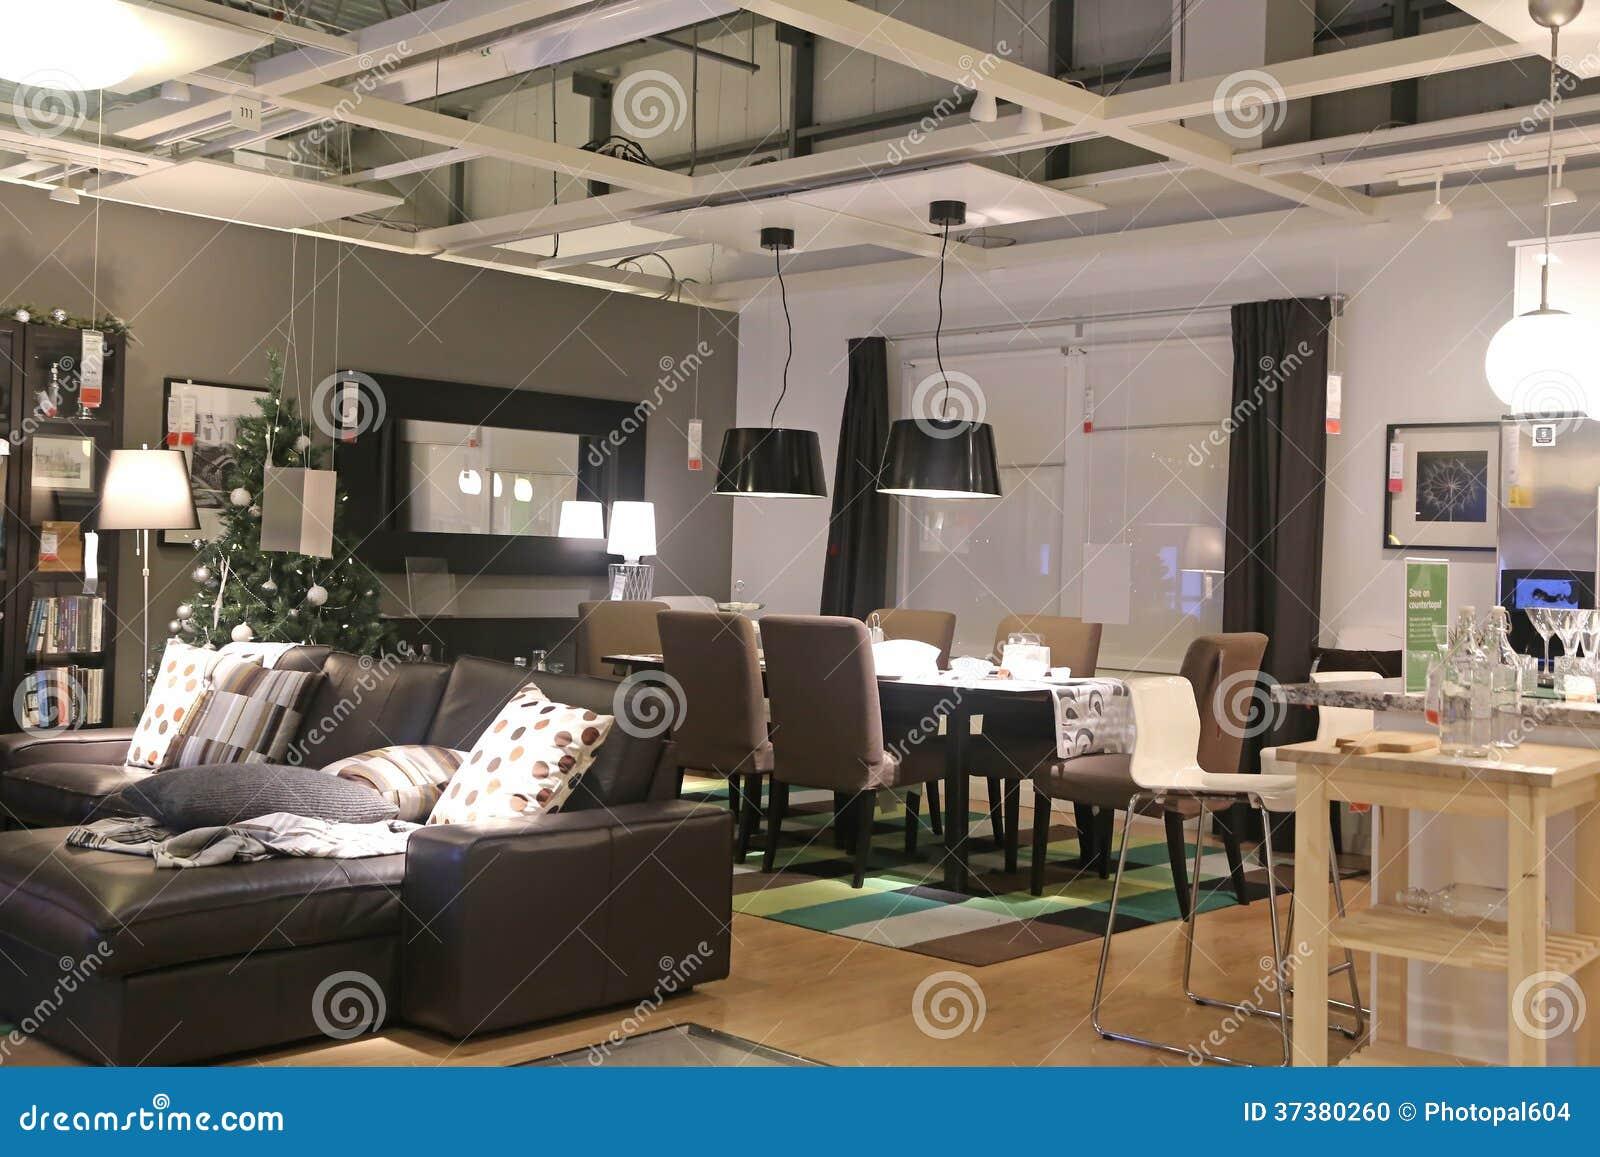 montrez la pi ce l 39 int rieur du magasin d 39 ikea image ditorial image 37380260. Black Bedroom Furniture Sets. Home Design Ideas